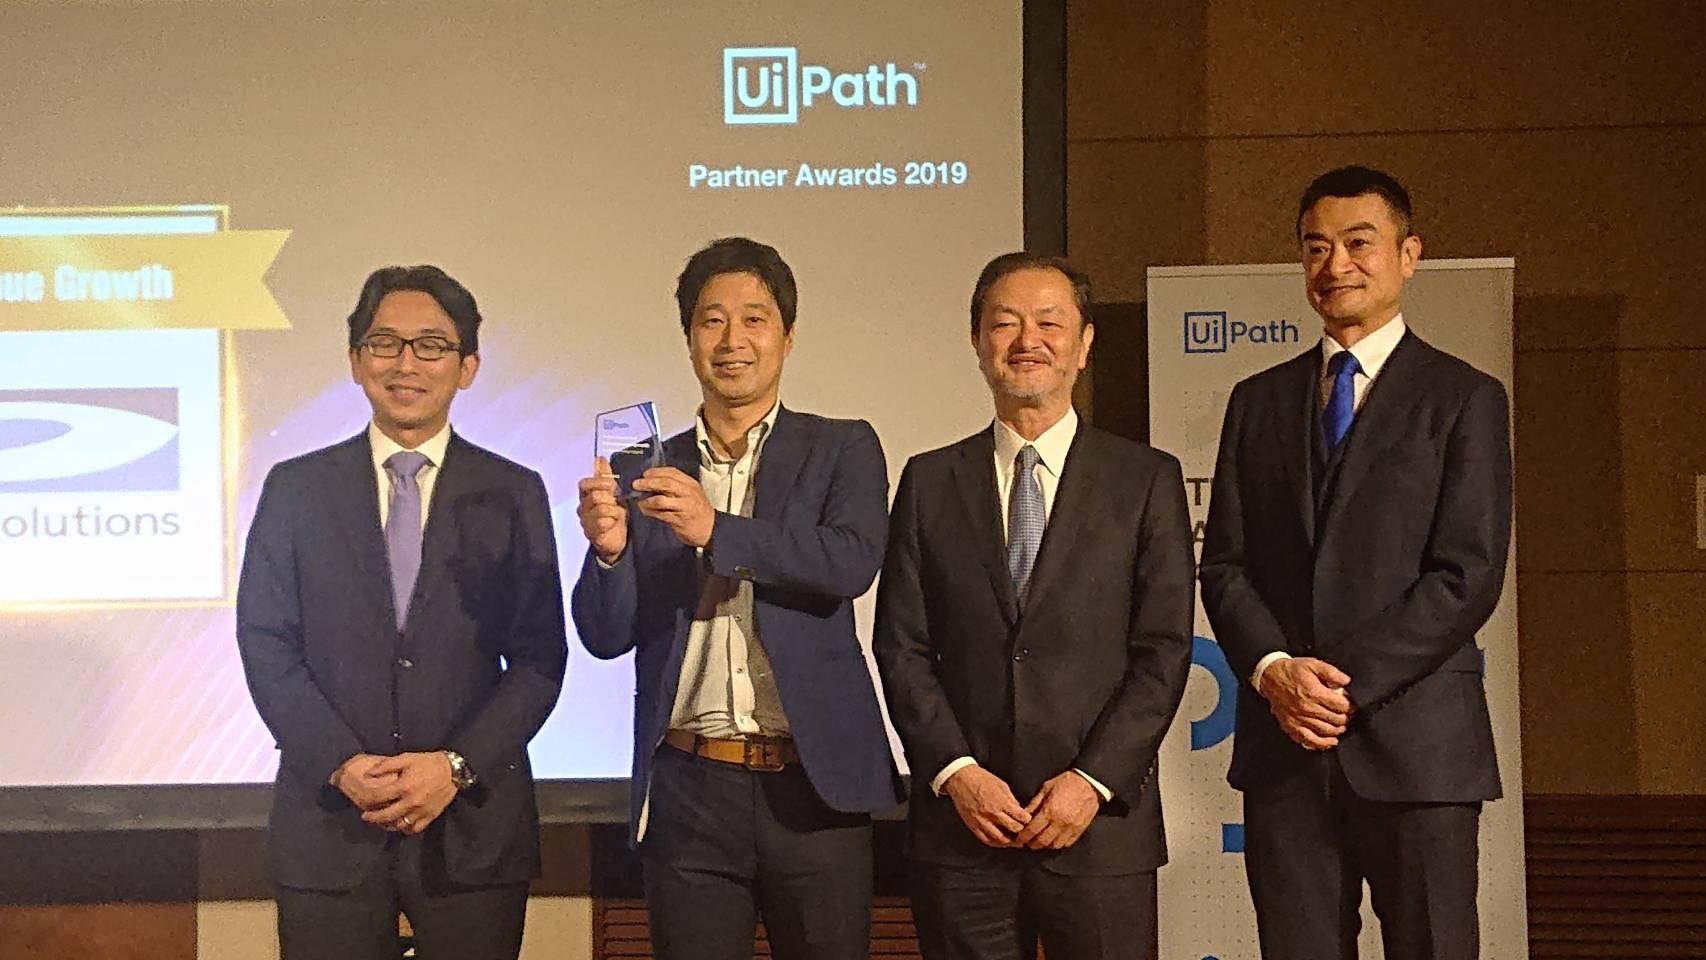 「UiPath Partner Awards 2019」受賞式の写真